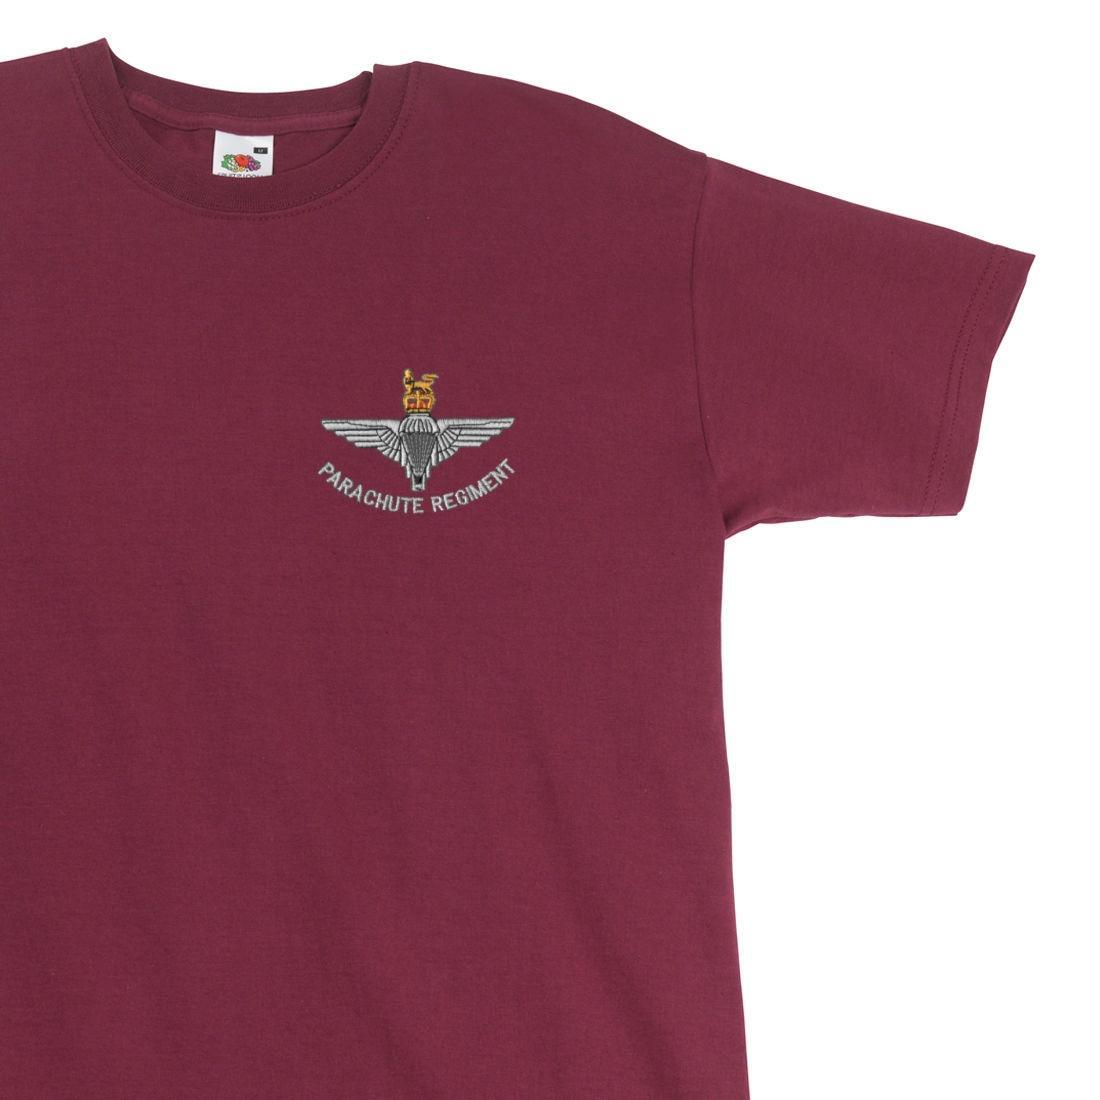 Sweatshirt 1 Para Parachute Regiment I